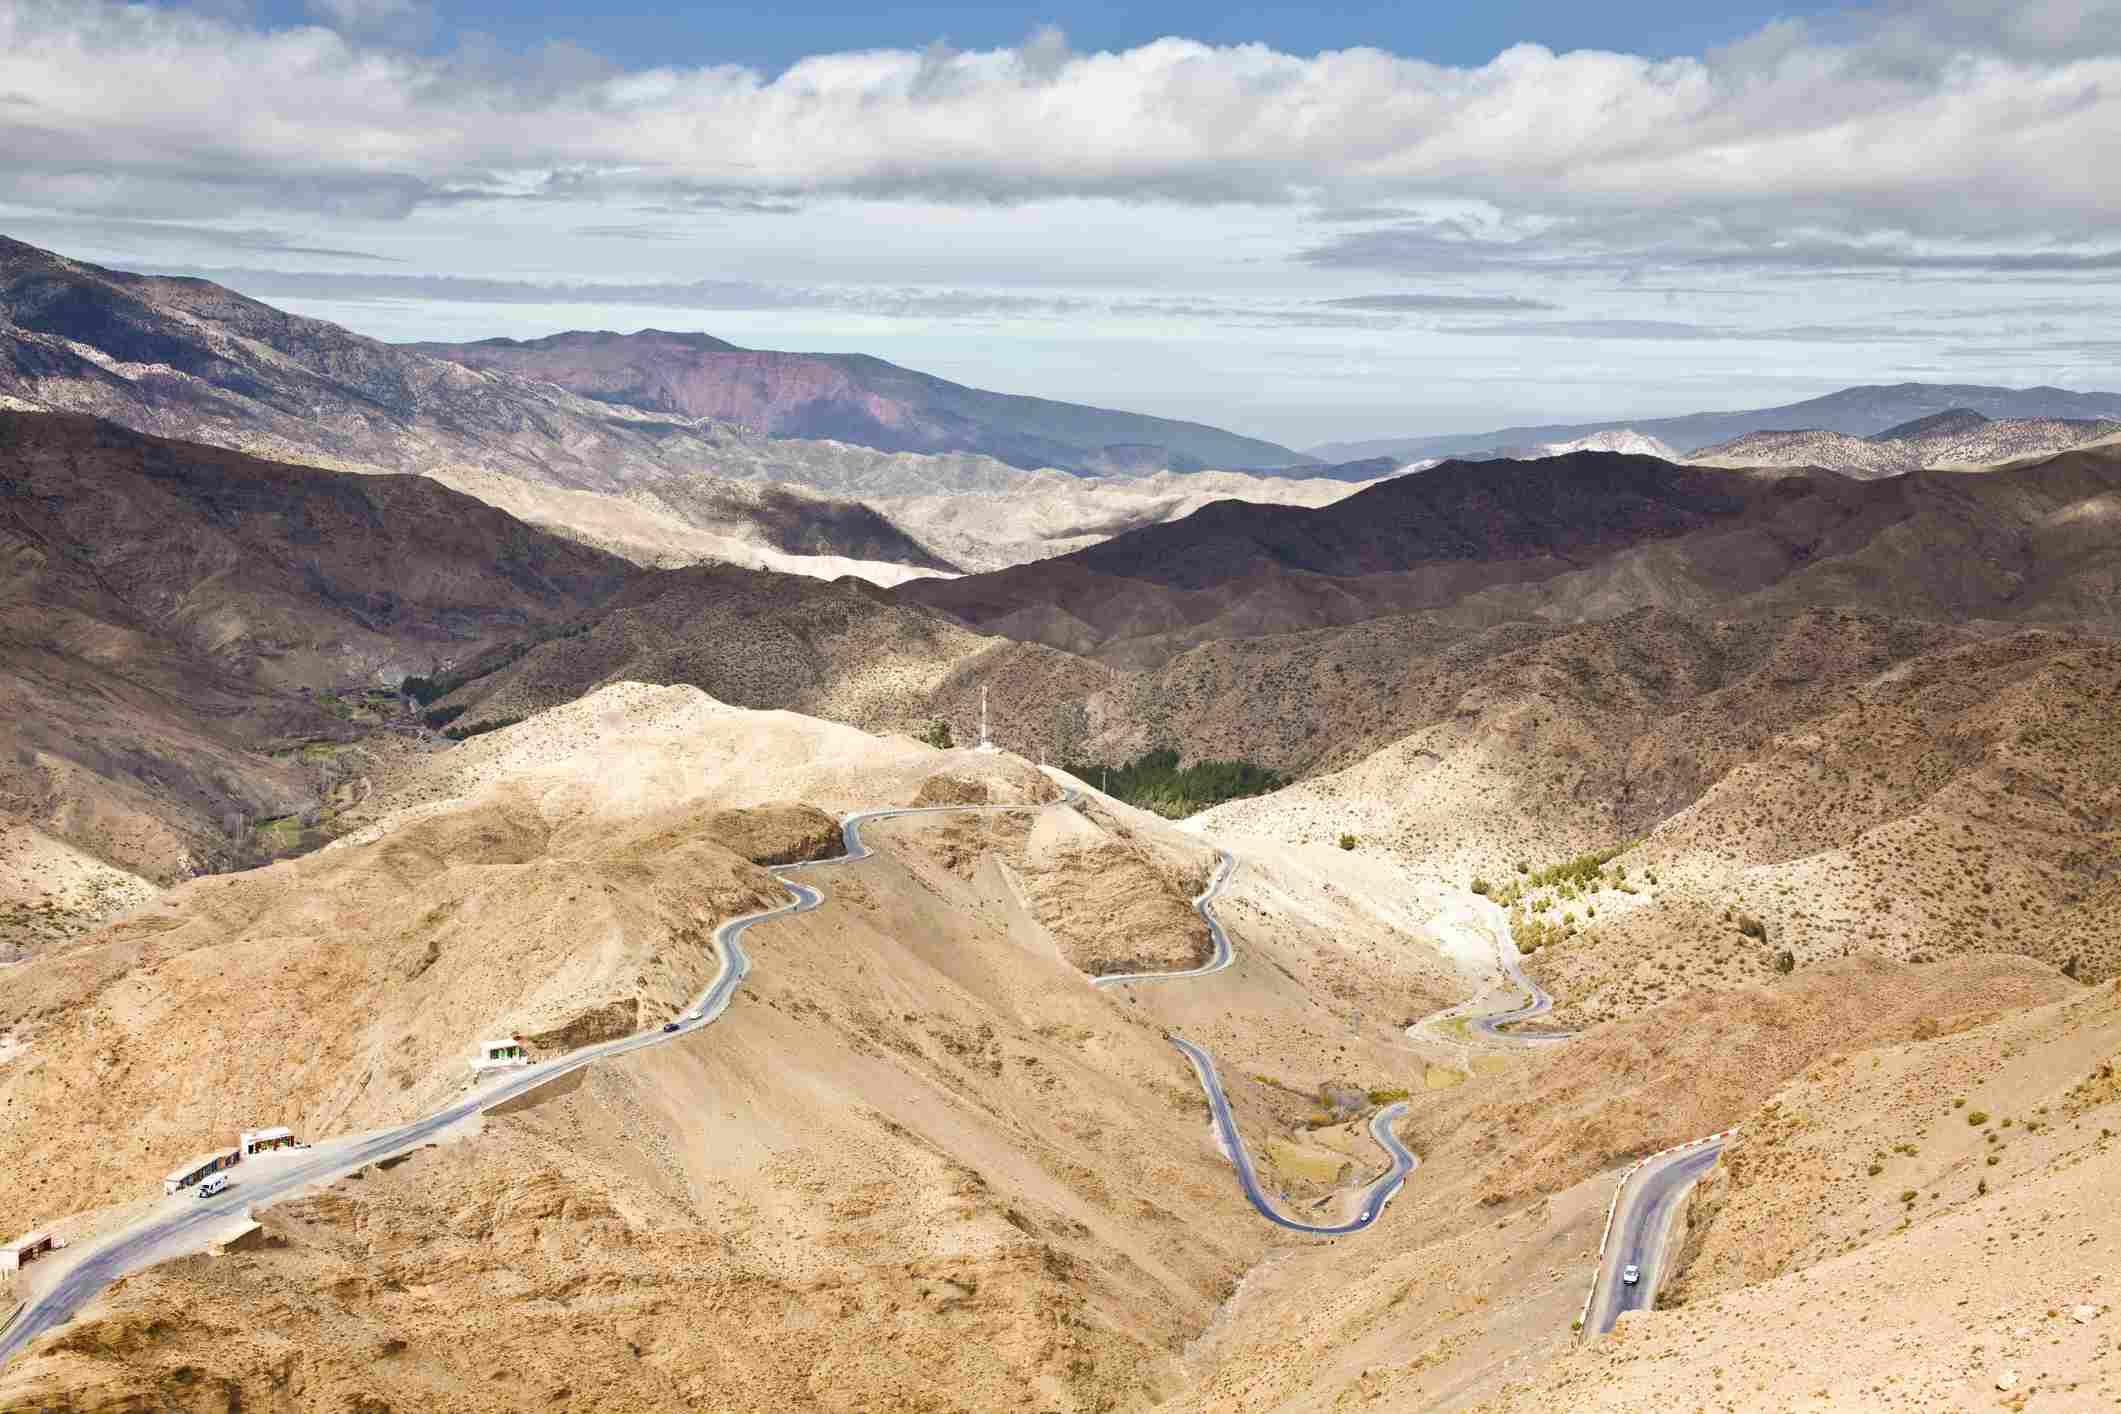 Tizi n'Tichka Pass near Ouarzazate, Morocco